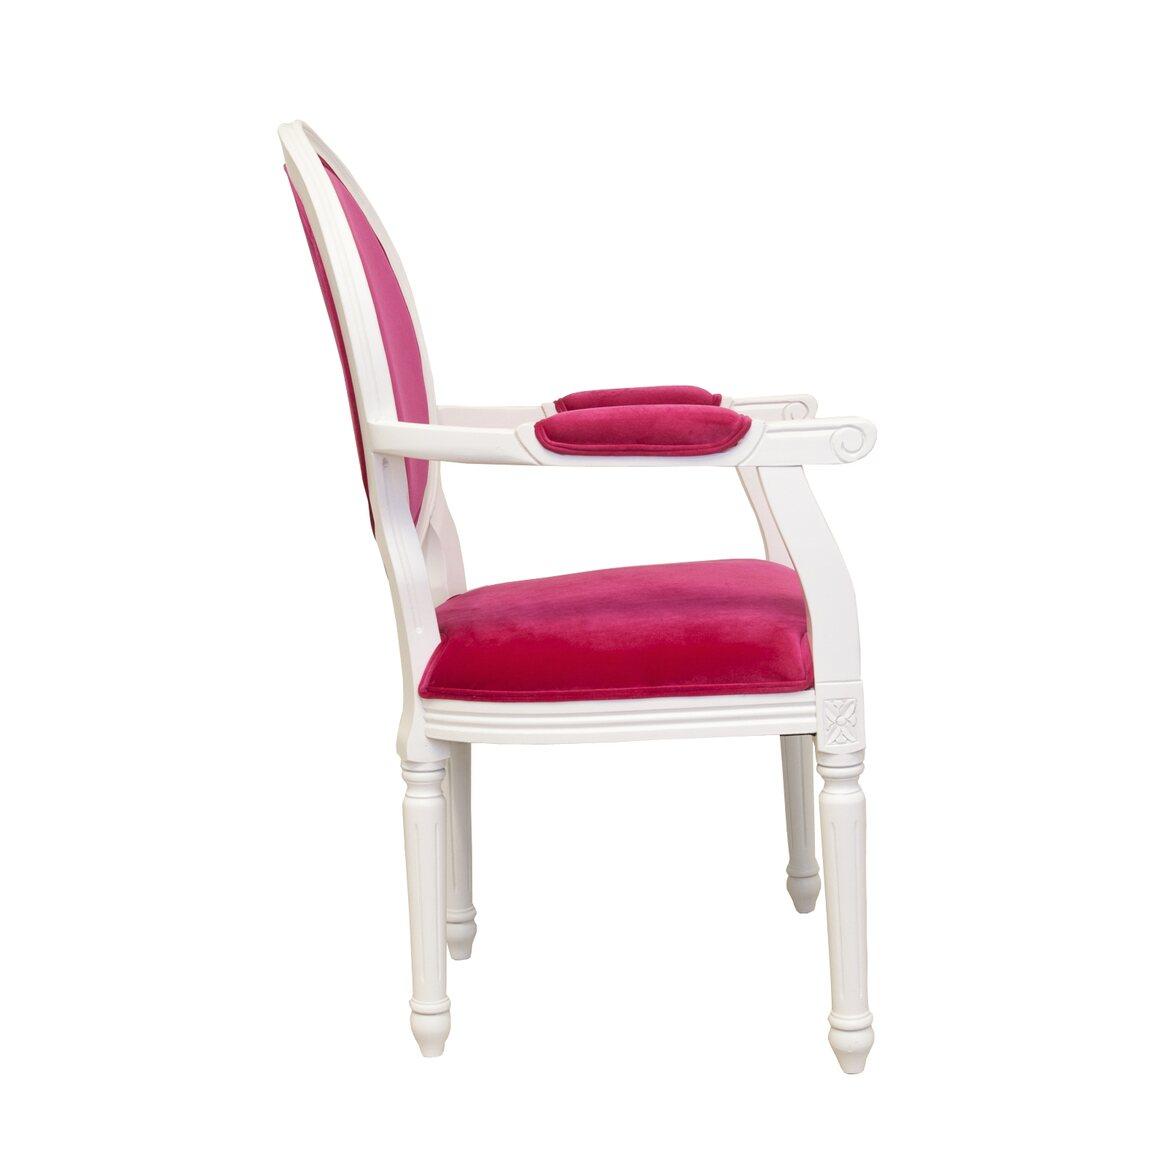 Стул Diella pink 2 | Обеденные стулья Kingsby